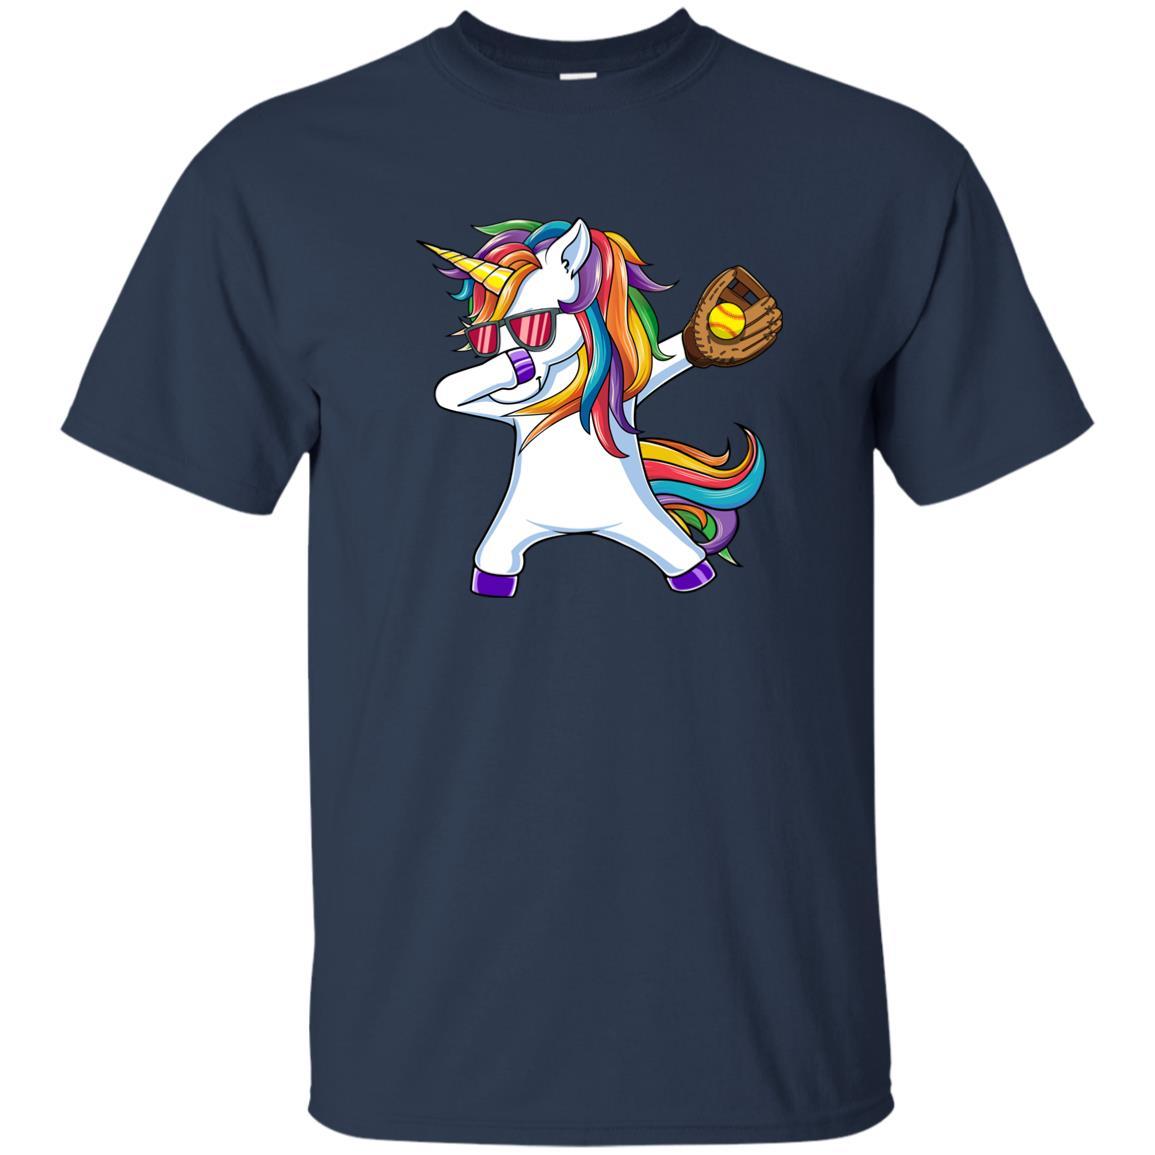 Dabbing Unicorn Softball Kids Funny Dab Dance Gift Unisex Short Sleeve